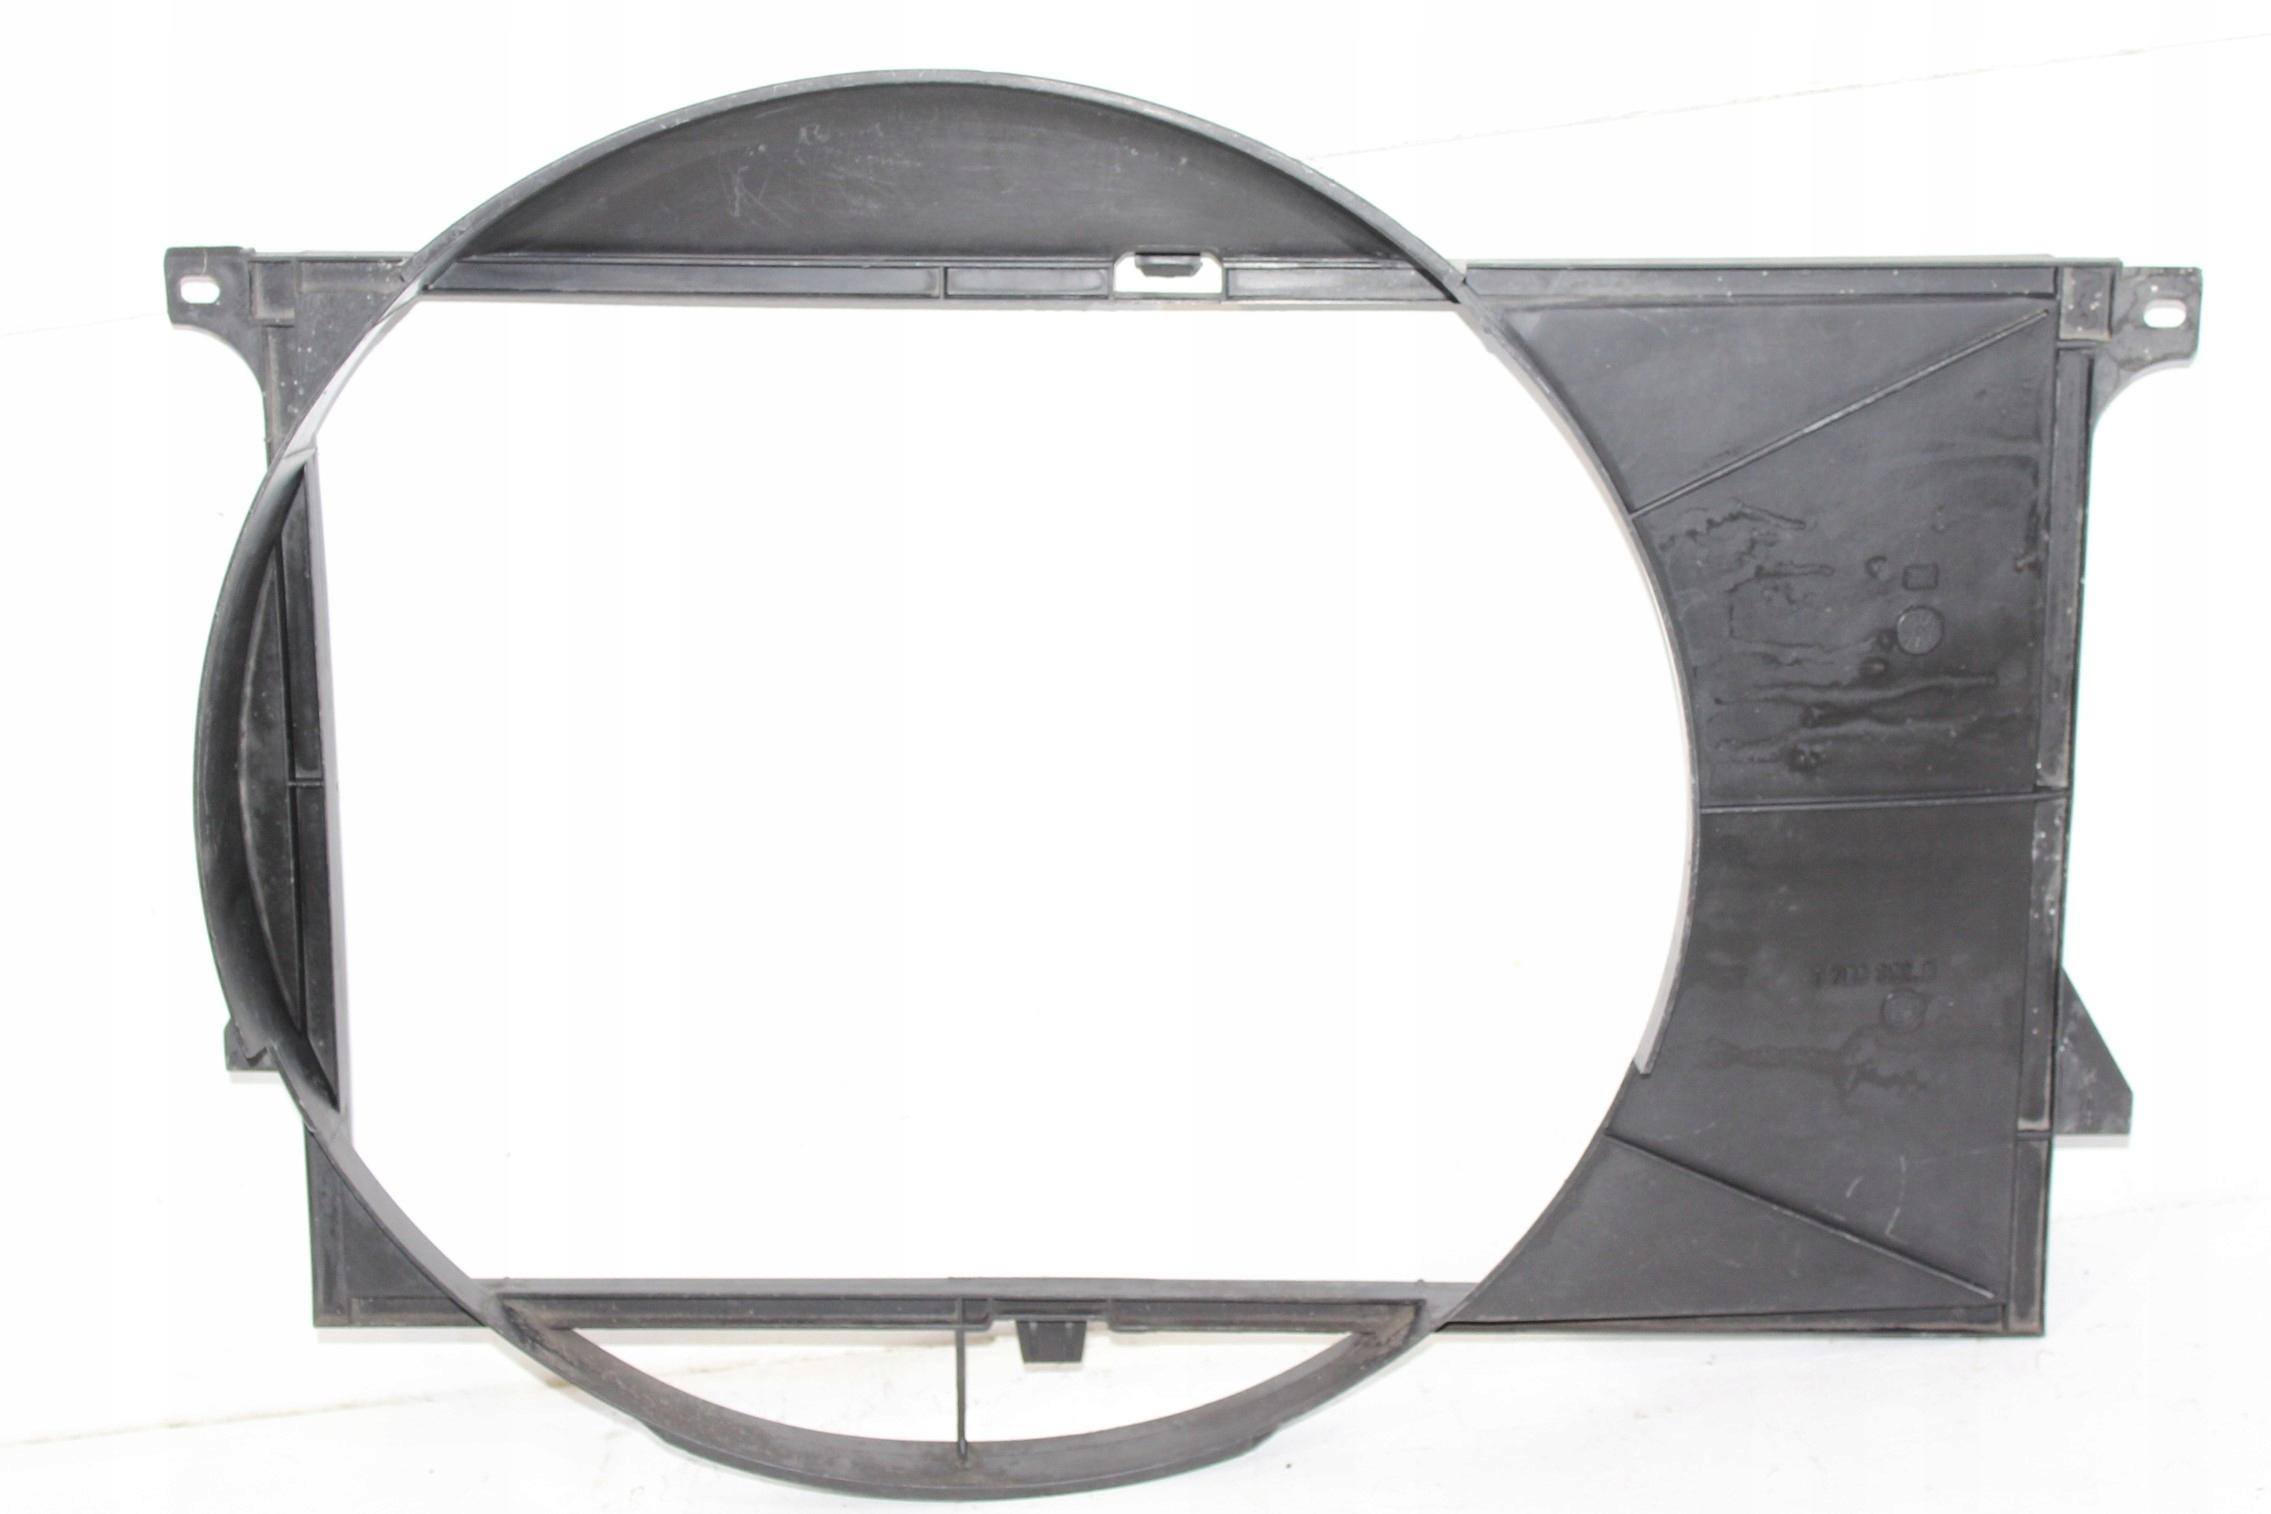 bmw e32 m30 крышка корпус вентилятора радиатора